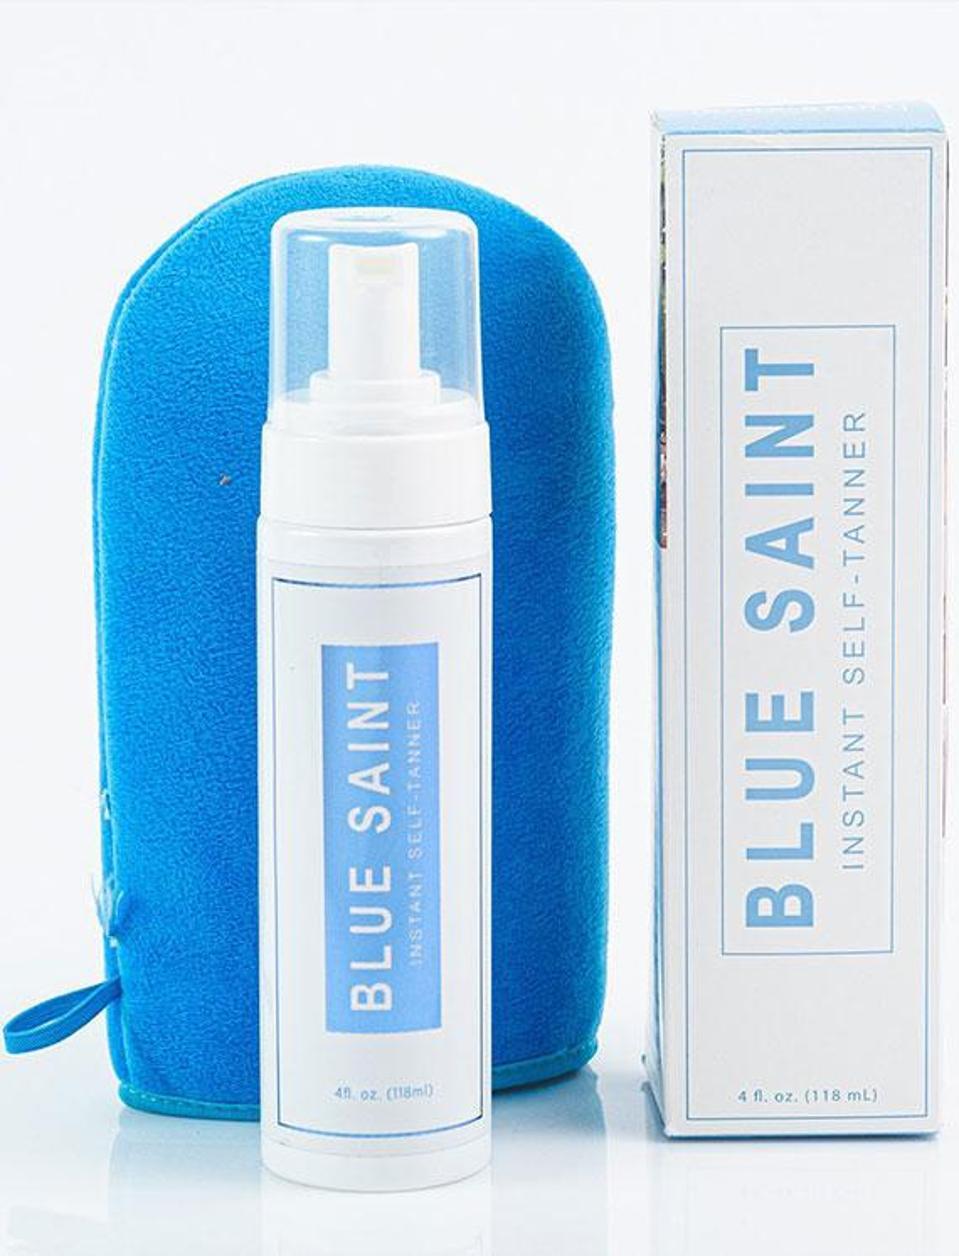 BLUE SAINT Instant Body Self Tanning Foam